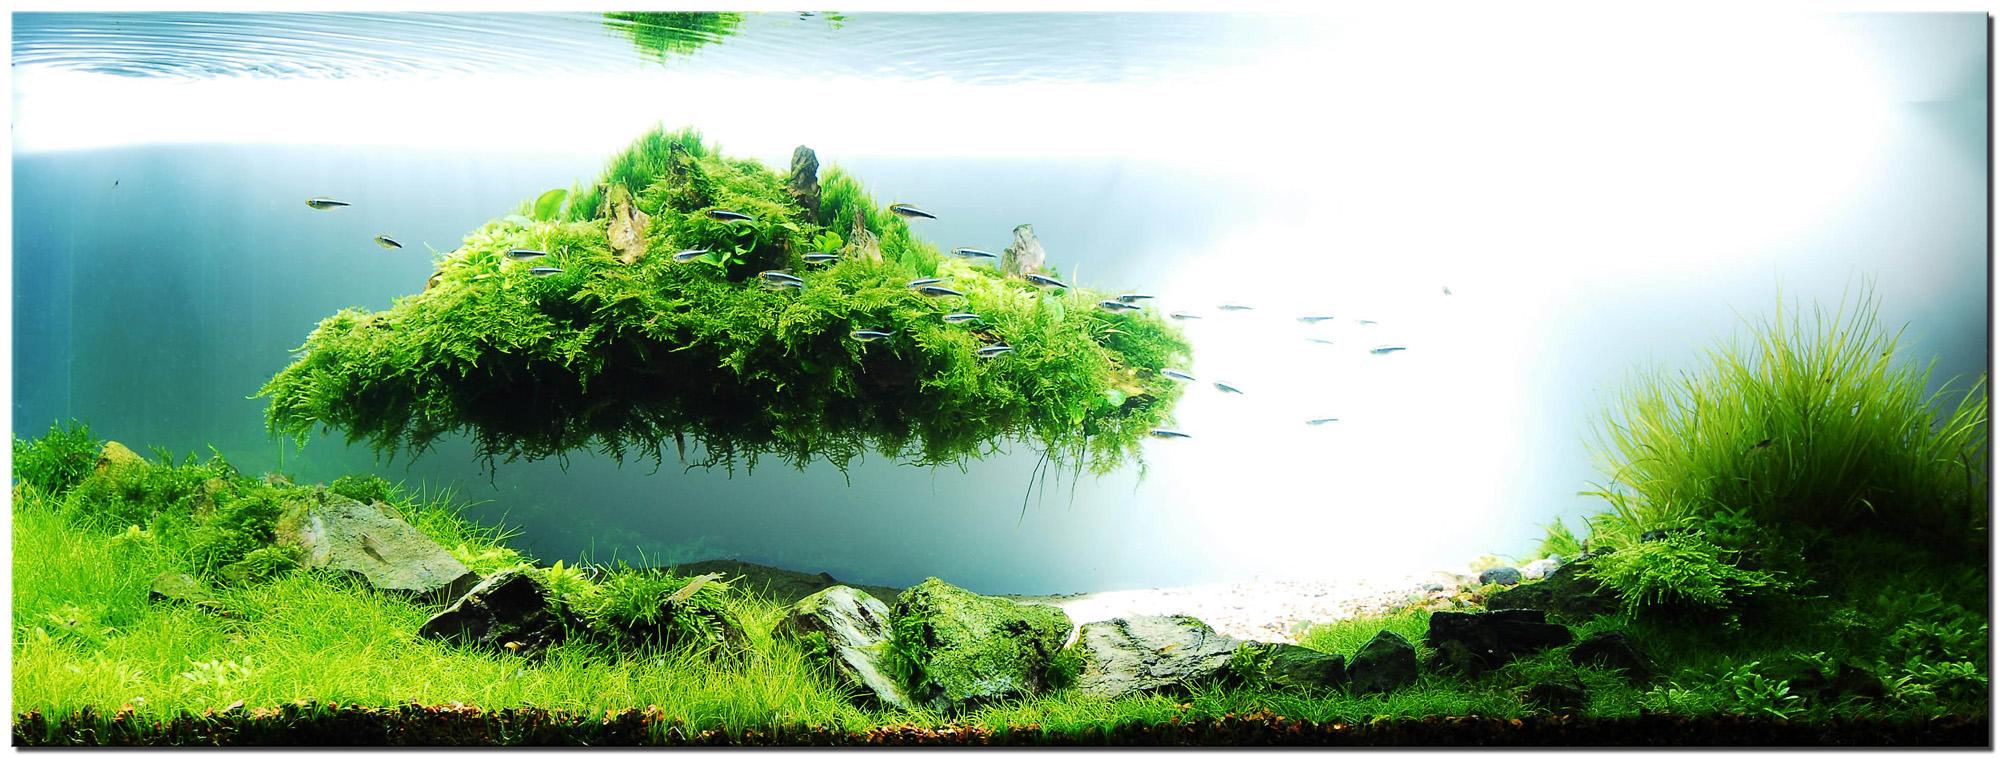 انتخاب گیاهان آکواریومی